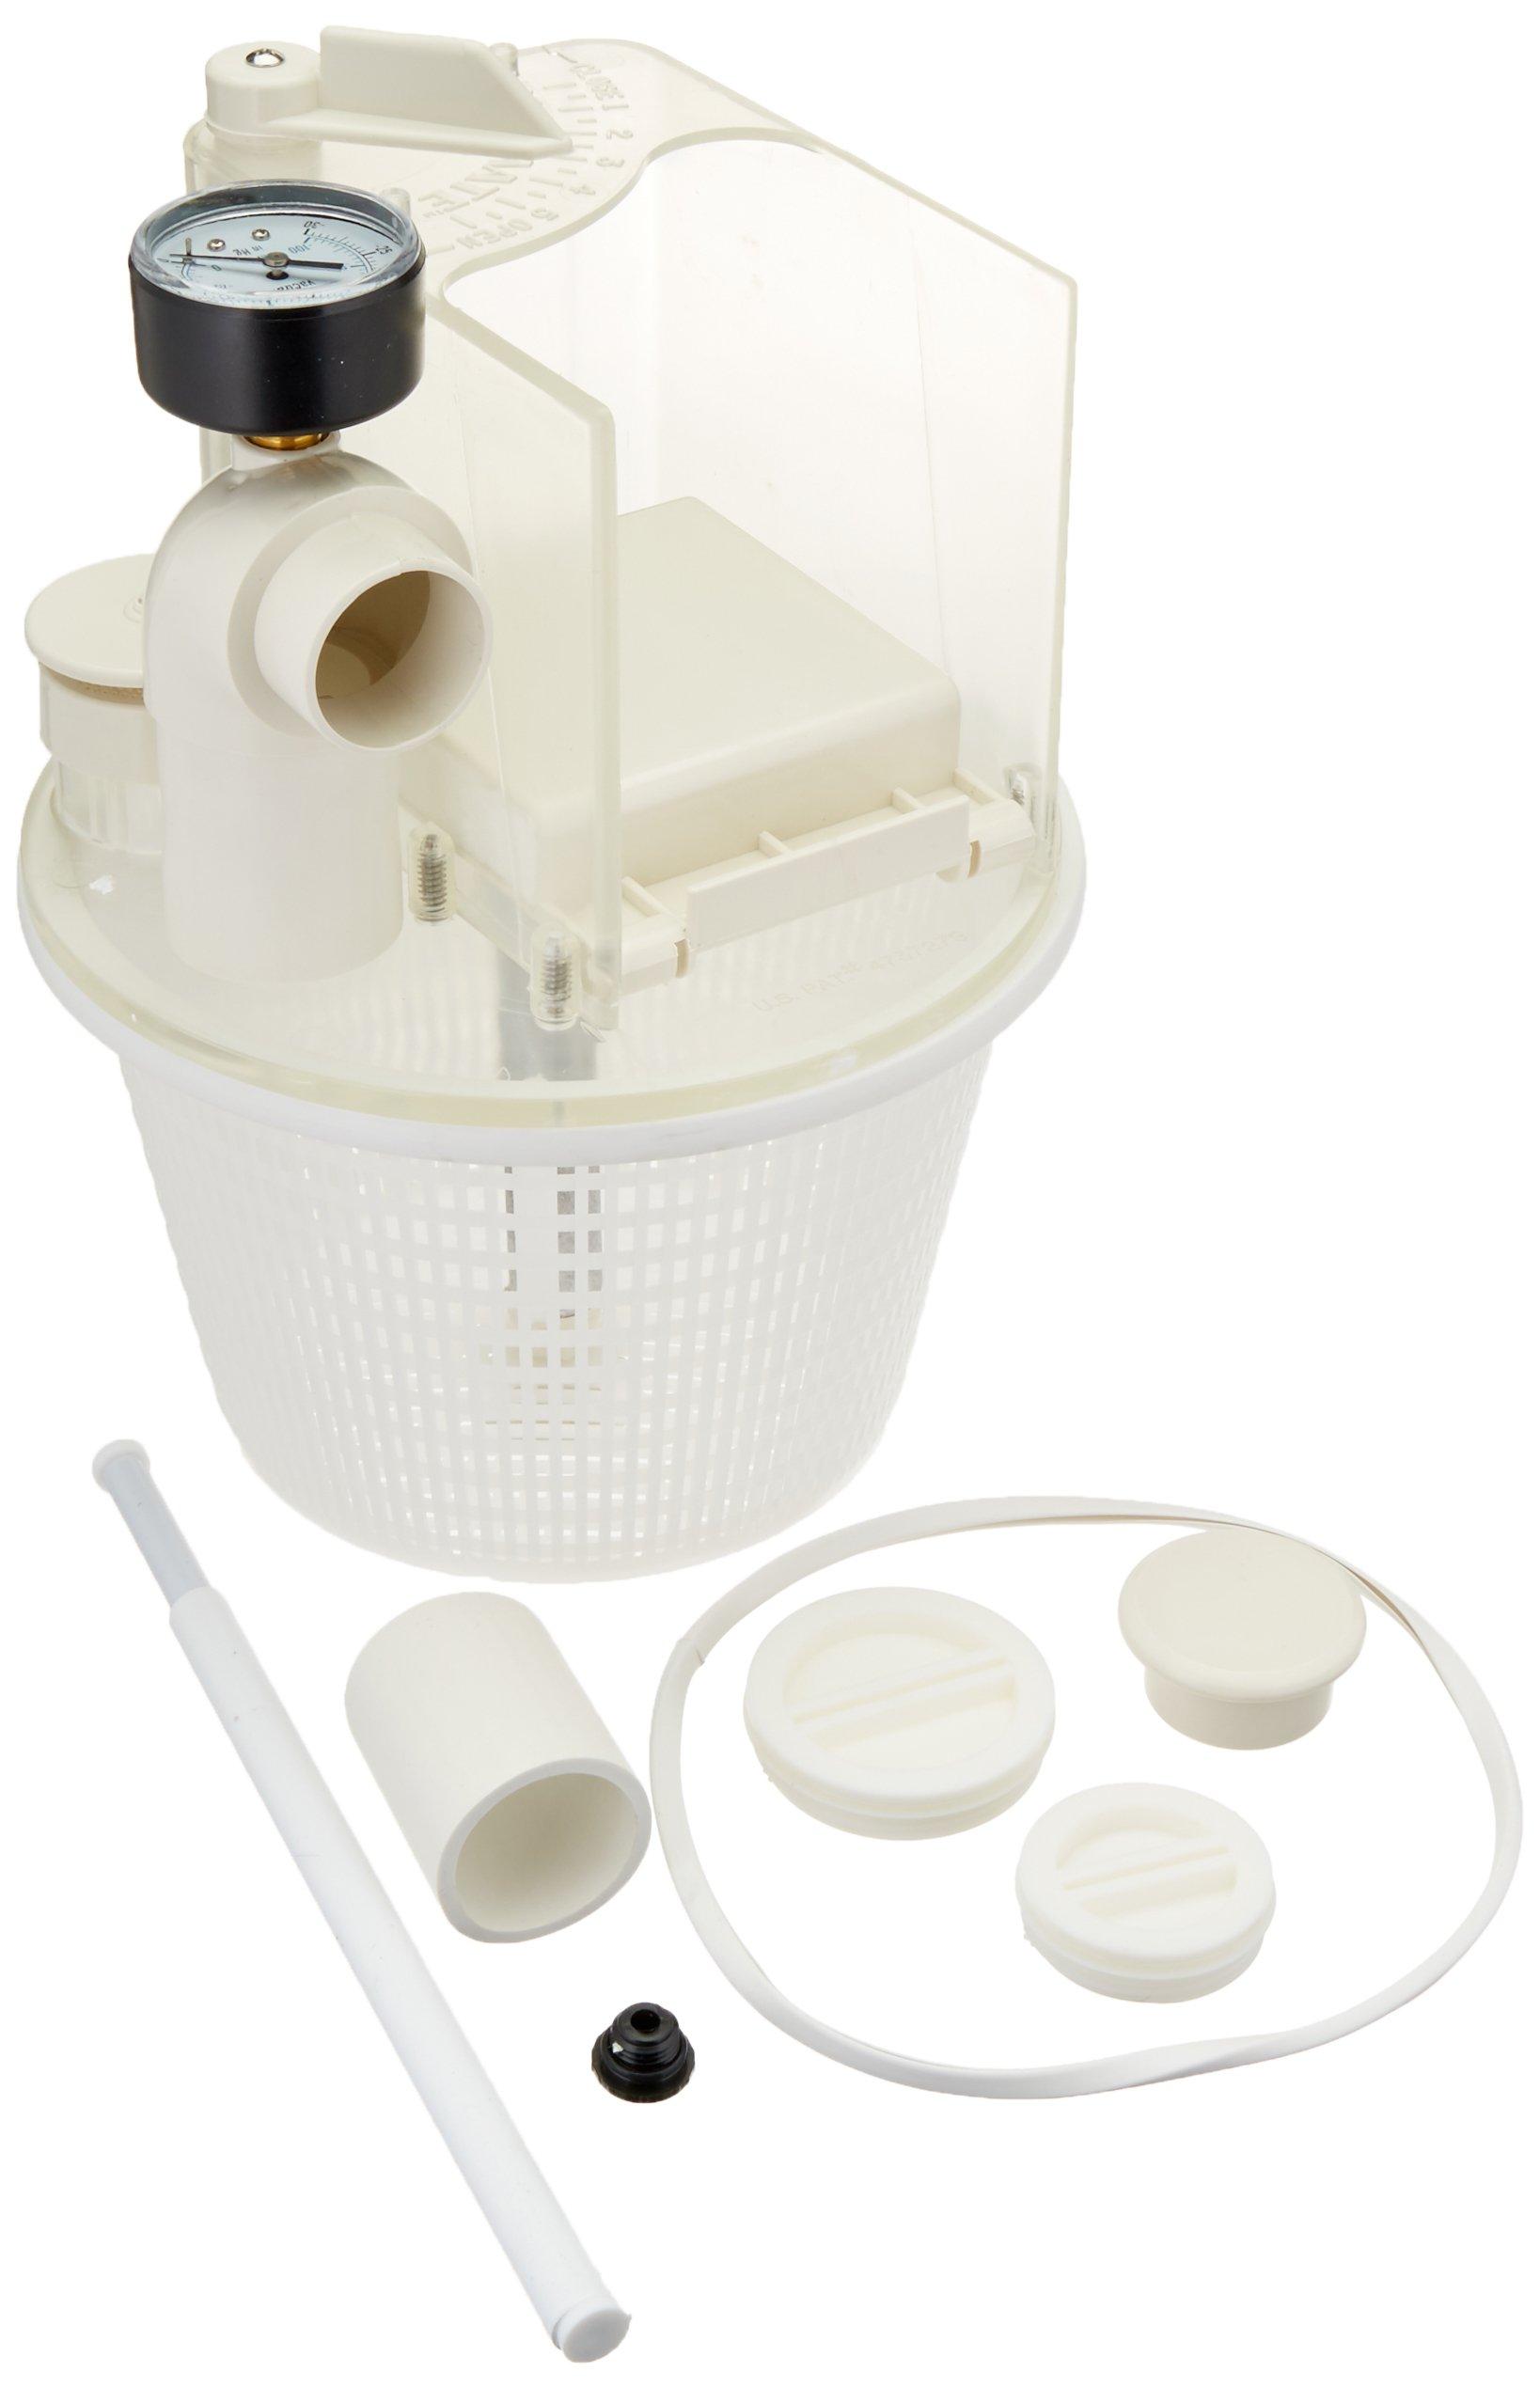 Pentair R211100 Vac-Mate Pool Cleaner Dispenser Box by Pentair (Image #1)